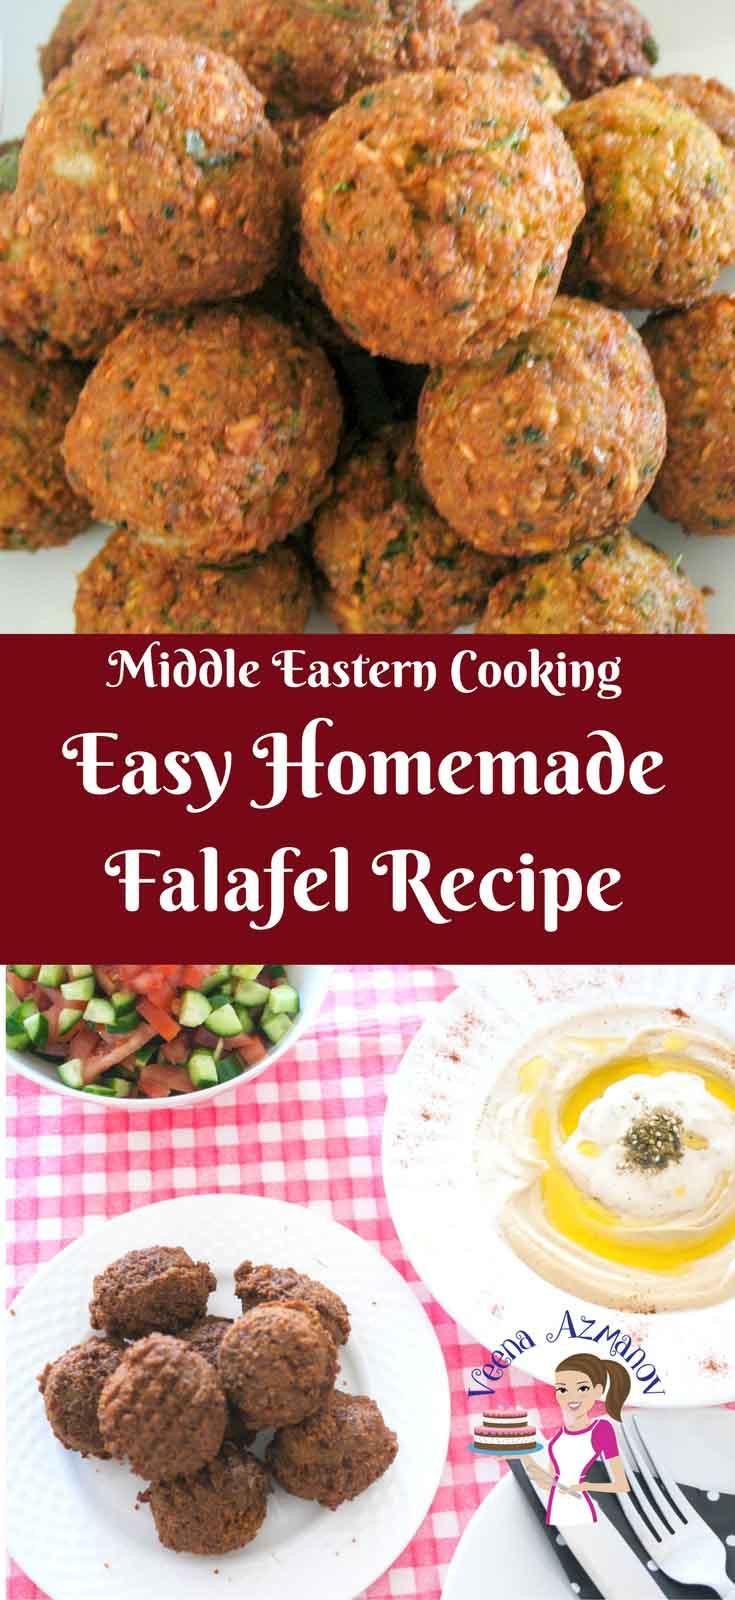 Easy Middle Eastern Recipes  Homemade Falafel Recipe Israeli Falafel Recipe Veena